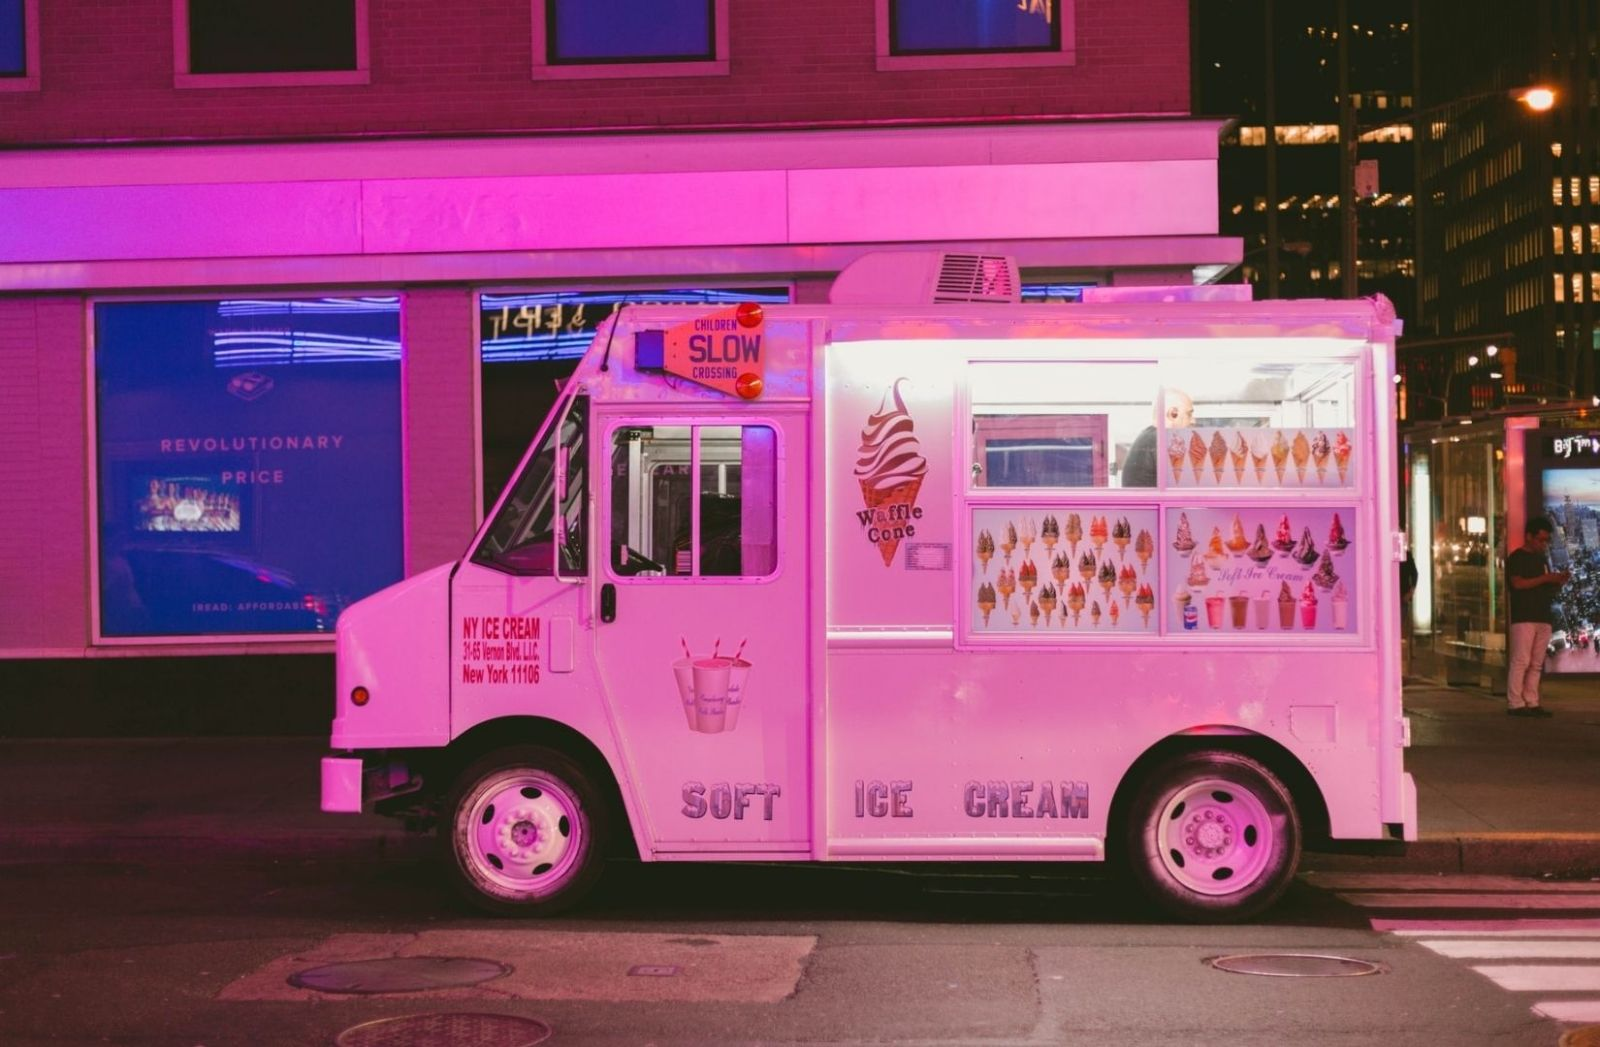 Pink Ice als Gesellschaftsmodell? (Foto: Paul Trienekens, Unsplash.com)